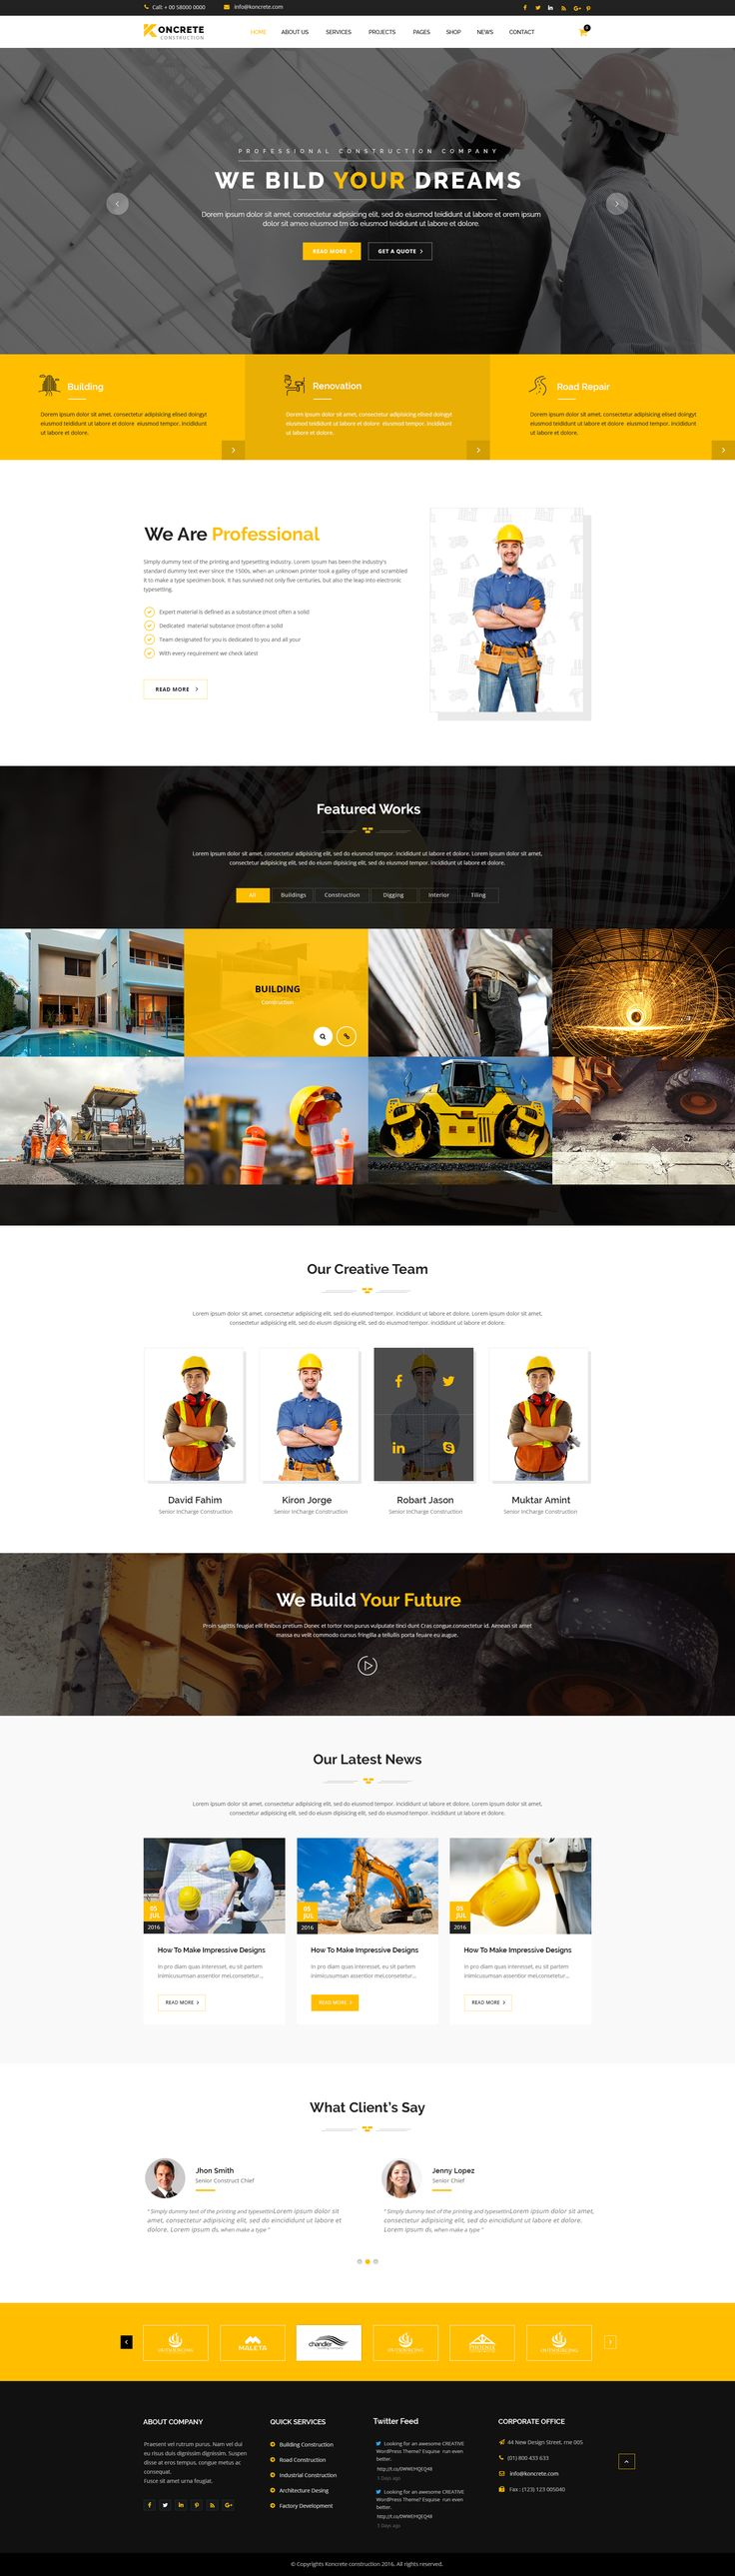 Dating web design company